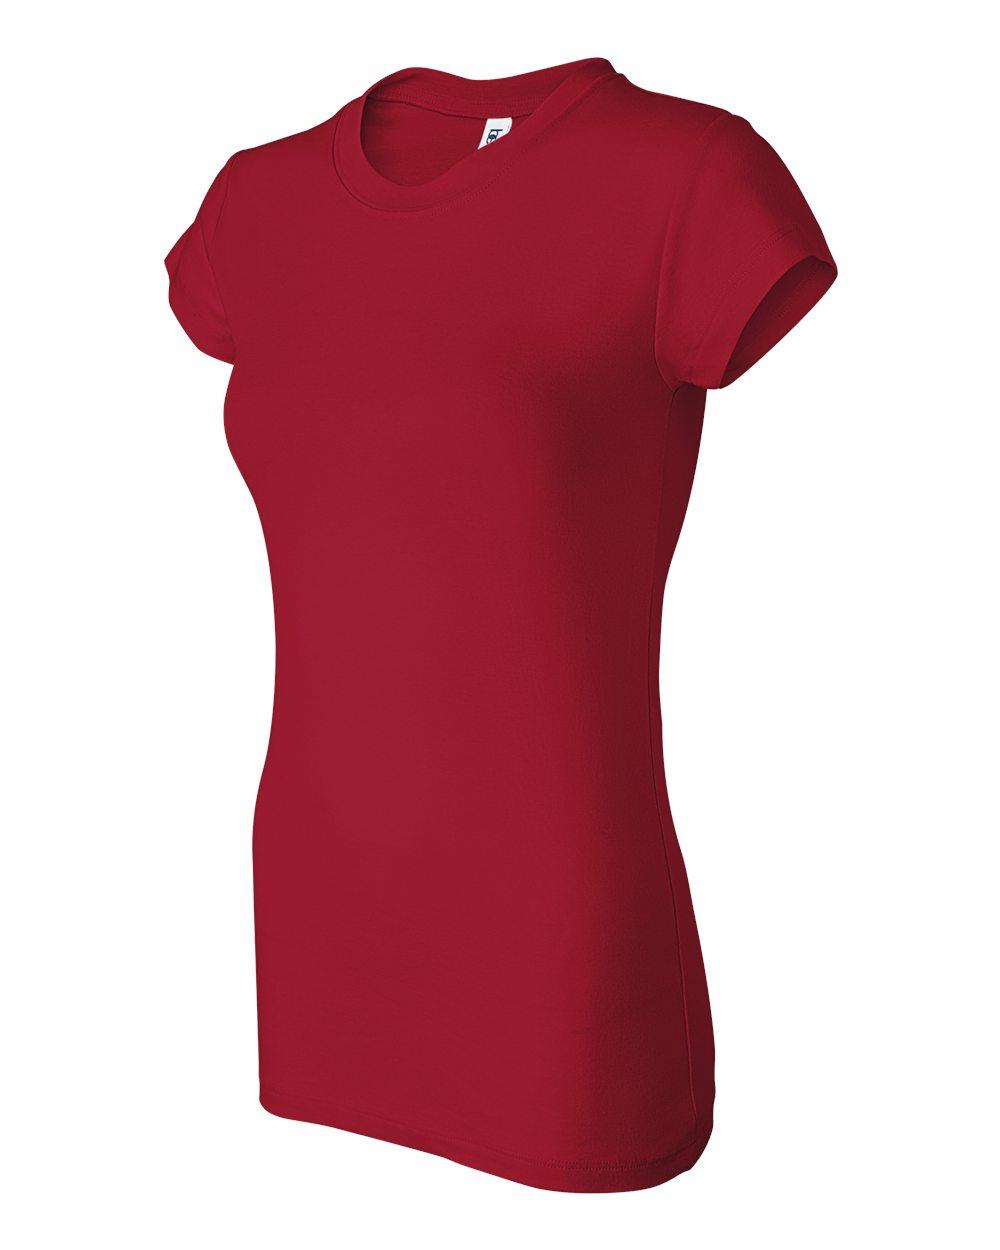 Bella-Canvas-Women-039-s-Sheer-Mini-Rib-Short-Sleeve-T-Shirt-8701-S-2XL thumbnail 9